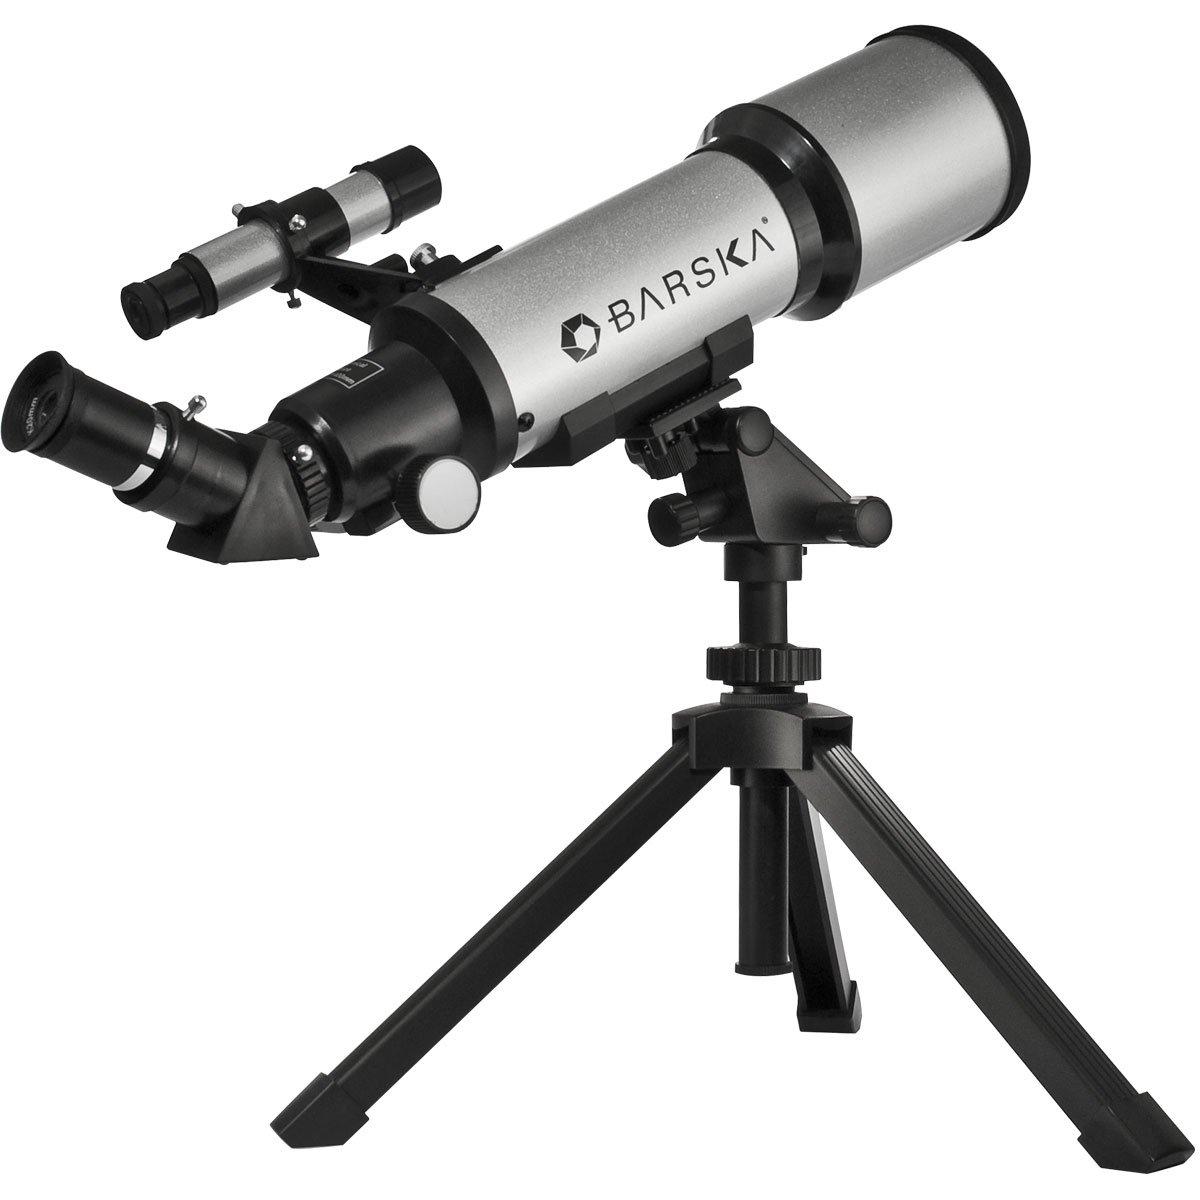 BARSKA Starwatcher 400x70mm Refractor Telescope w/Tabletop Tripod & Carry Case